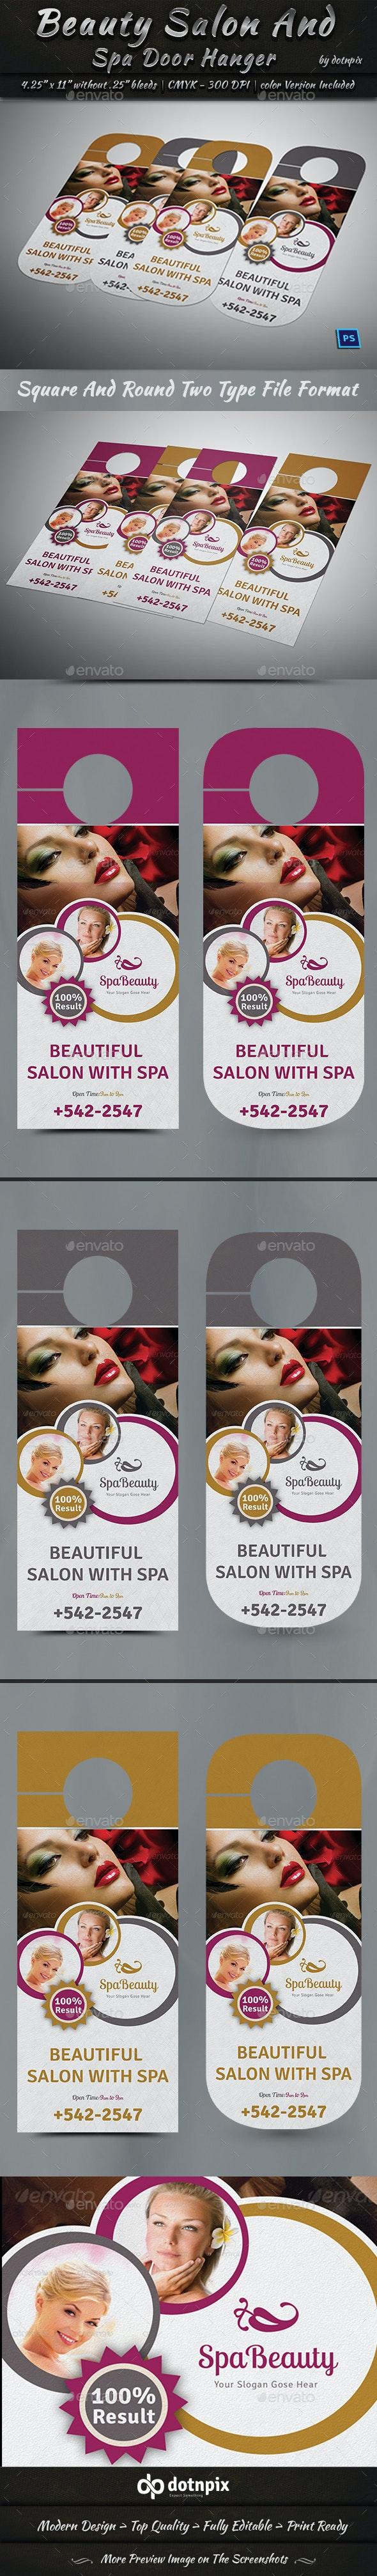 Beauty Salon And Spa Door Hanger - Miscellaneous Print Templates